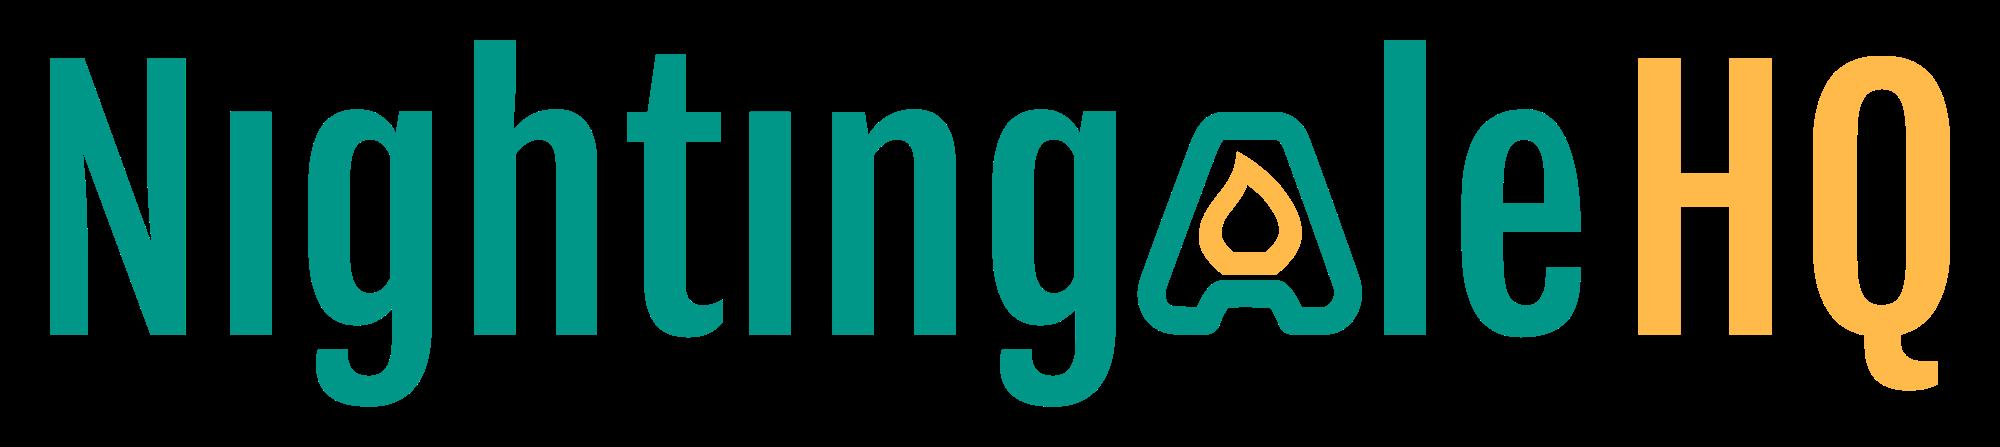 Nightingale HQ